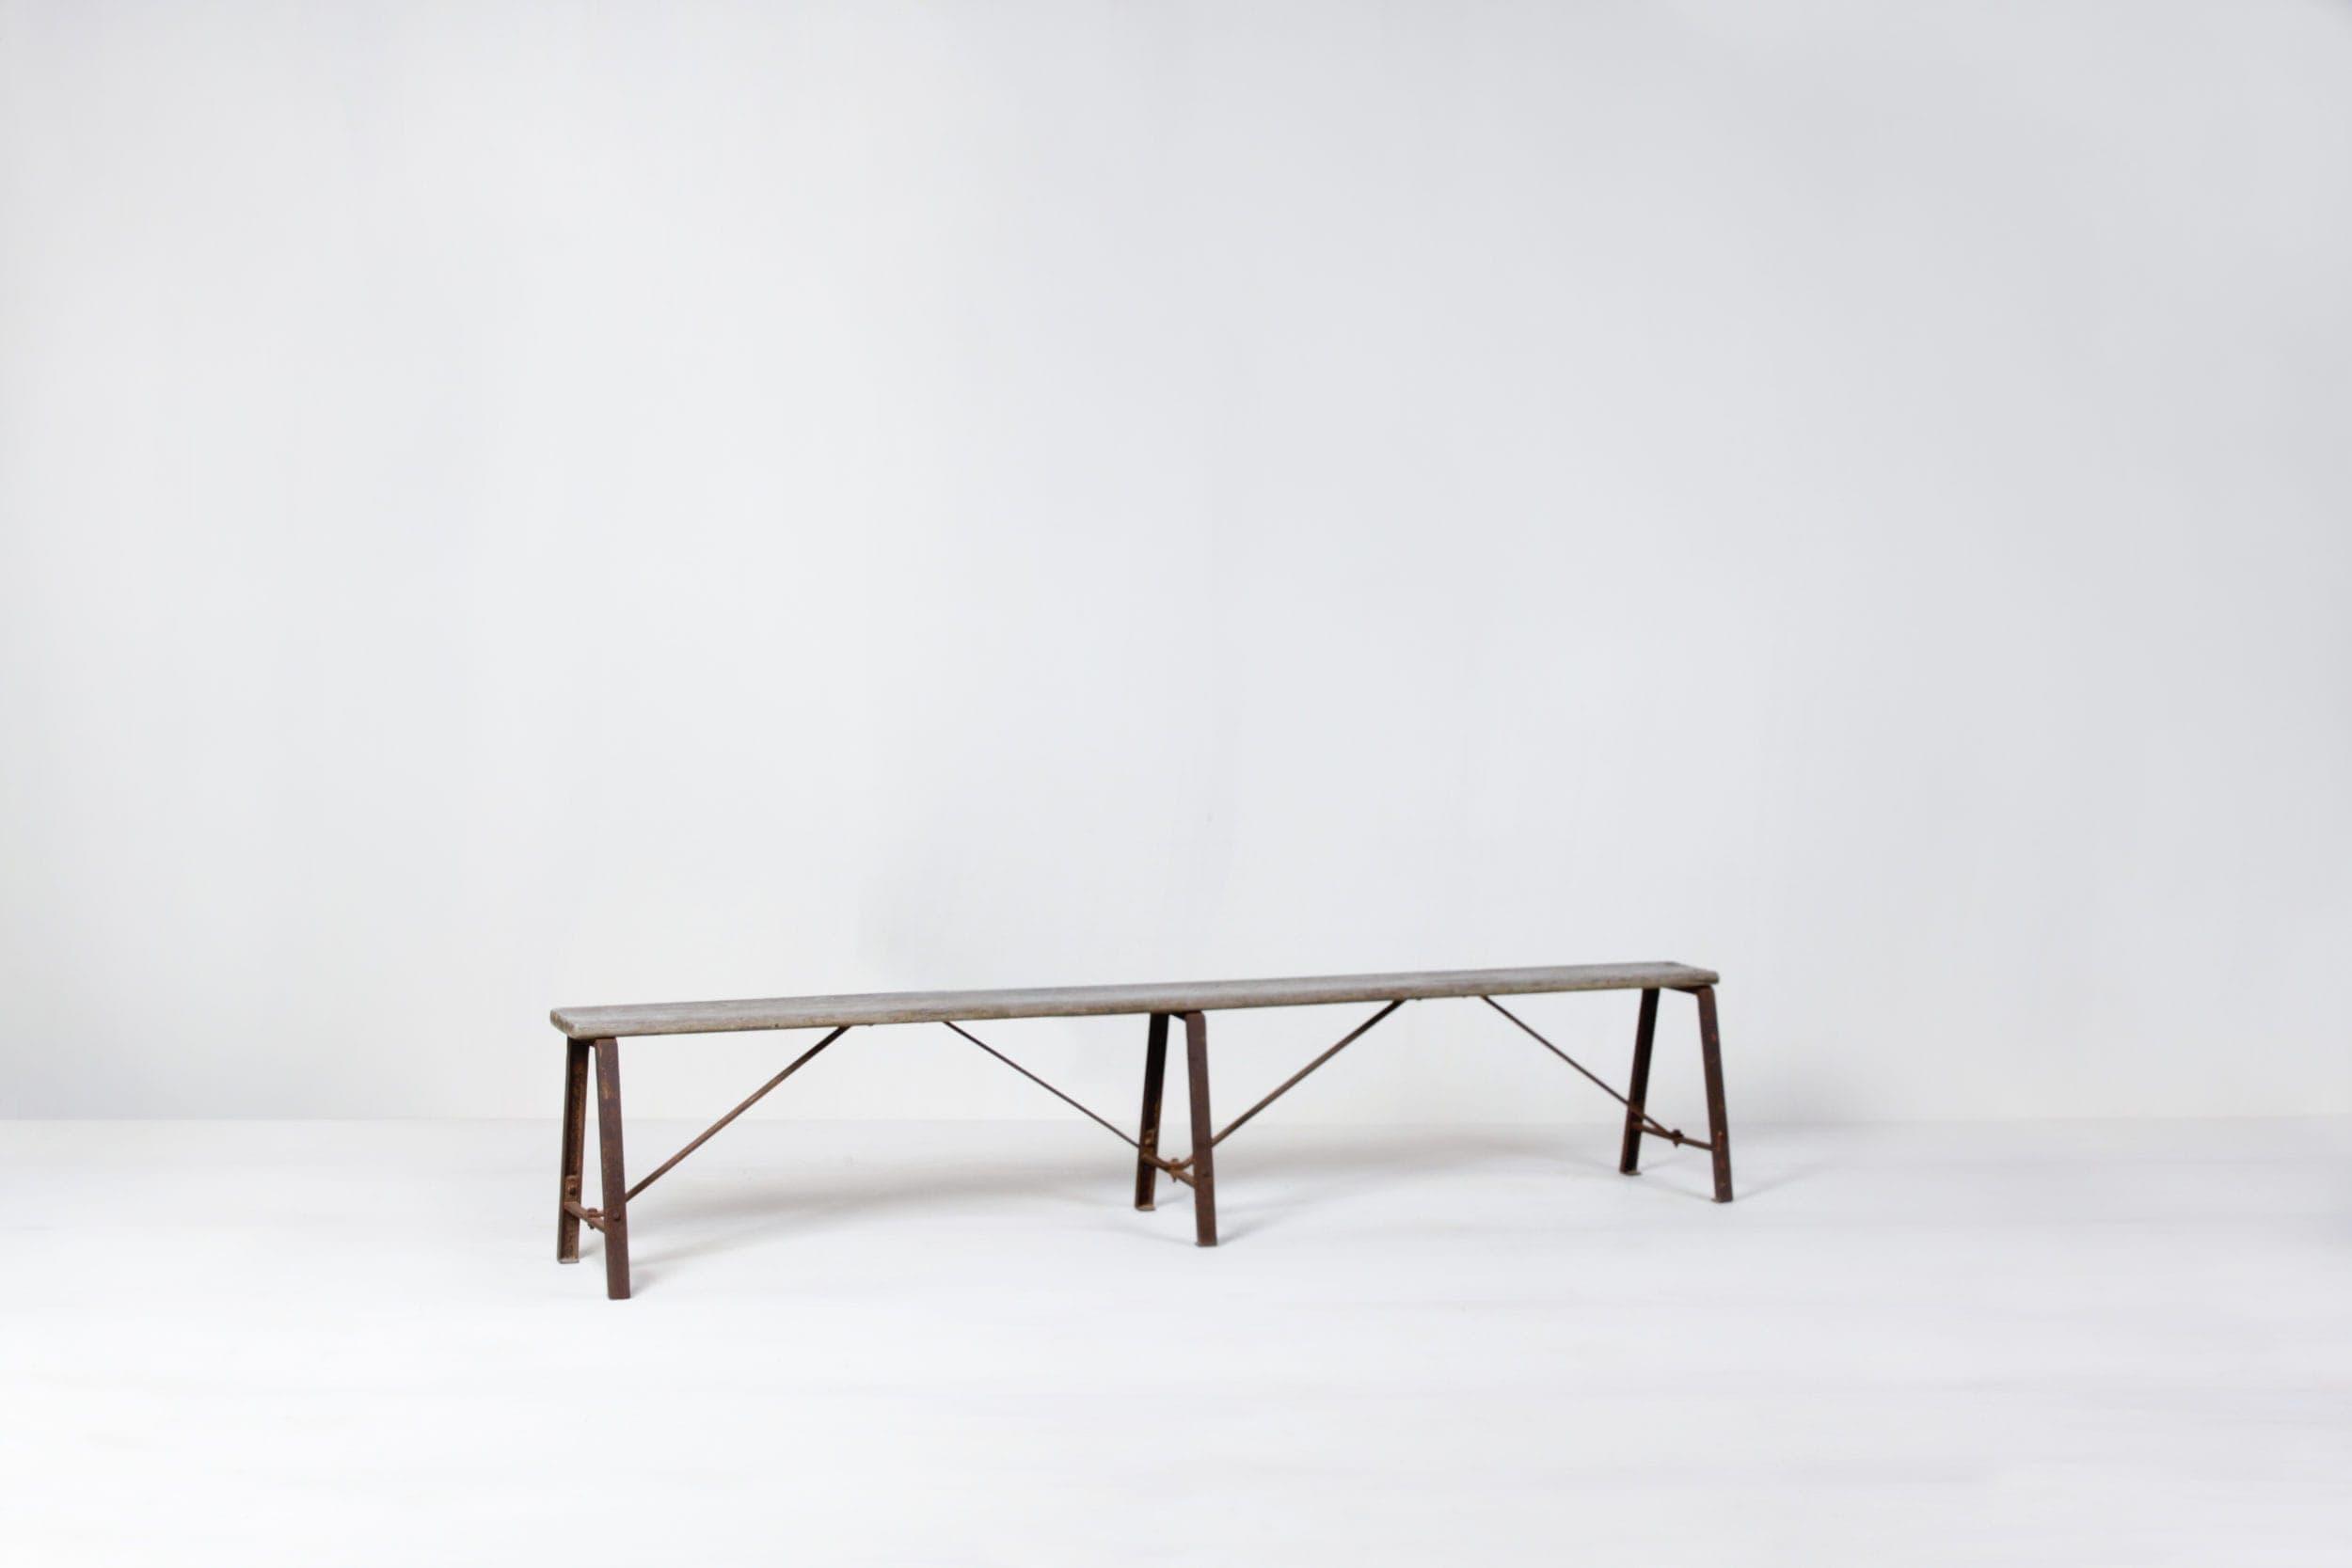 Mietmöbel aus Holz und Metall